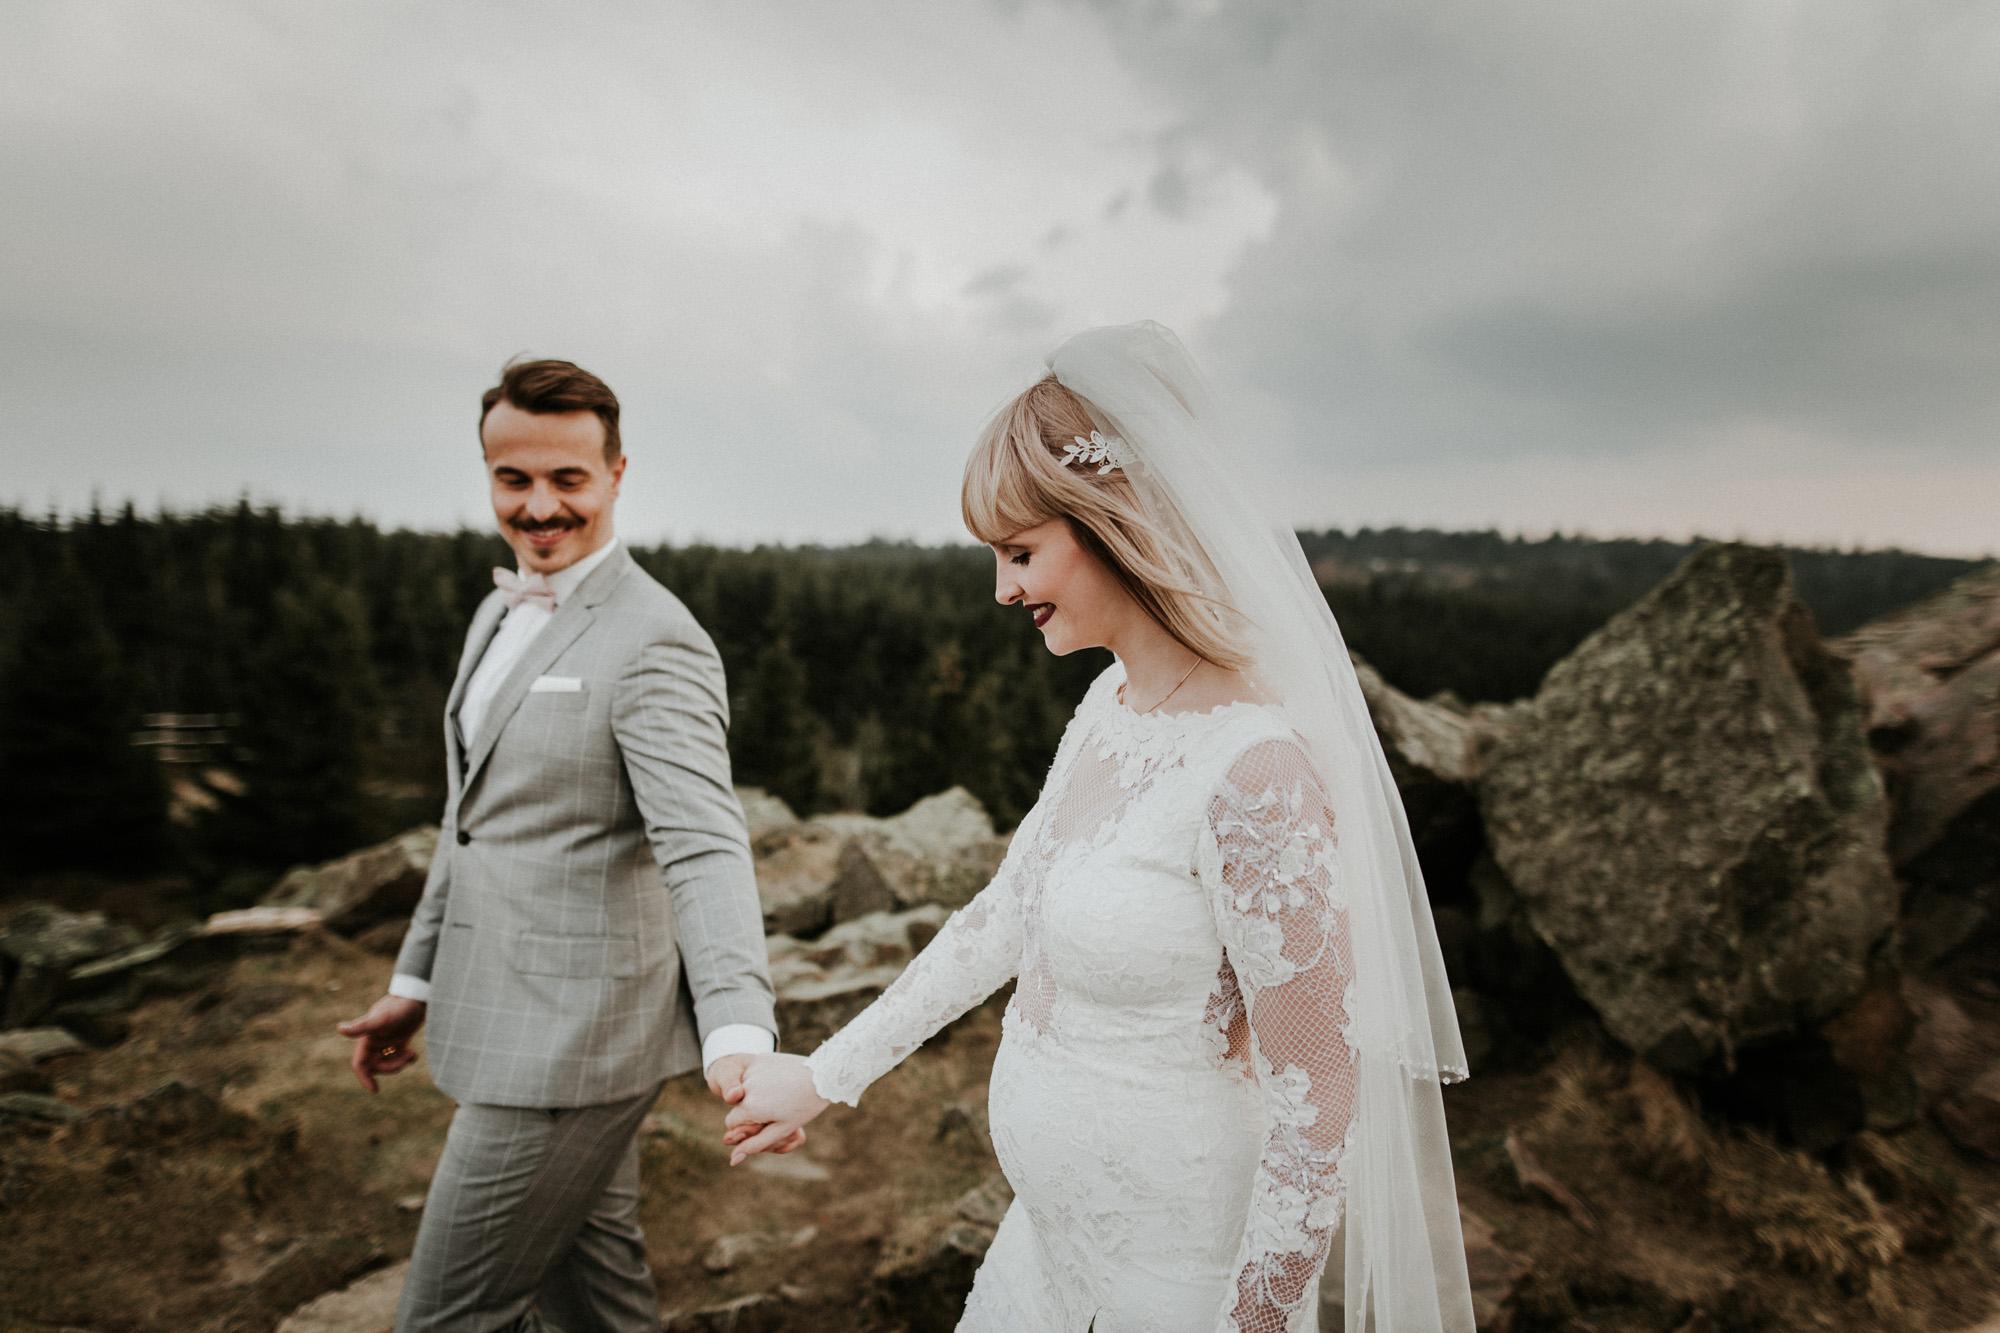 DanielaMarquardtPhotography_Hochzeitsfotograf_Düsseldorf_Köln_Mallorca_Bayern_Austria_Harz_LinaundMaik_Afterwedding-Shooting_Weddingphotographer_Ibiza_Tuskany_Italien_Toskana24